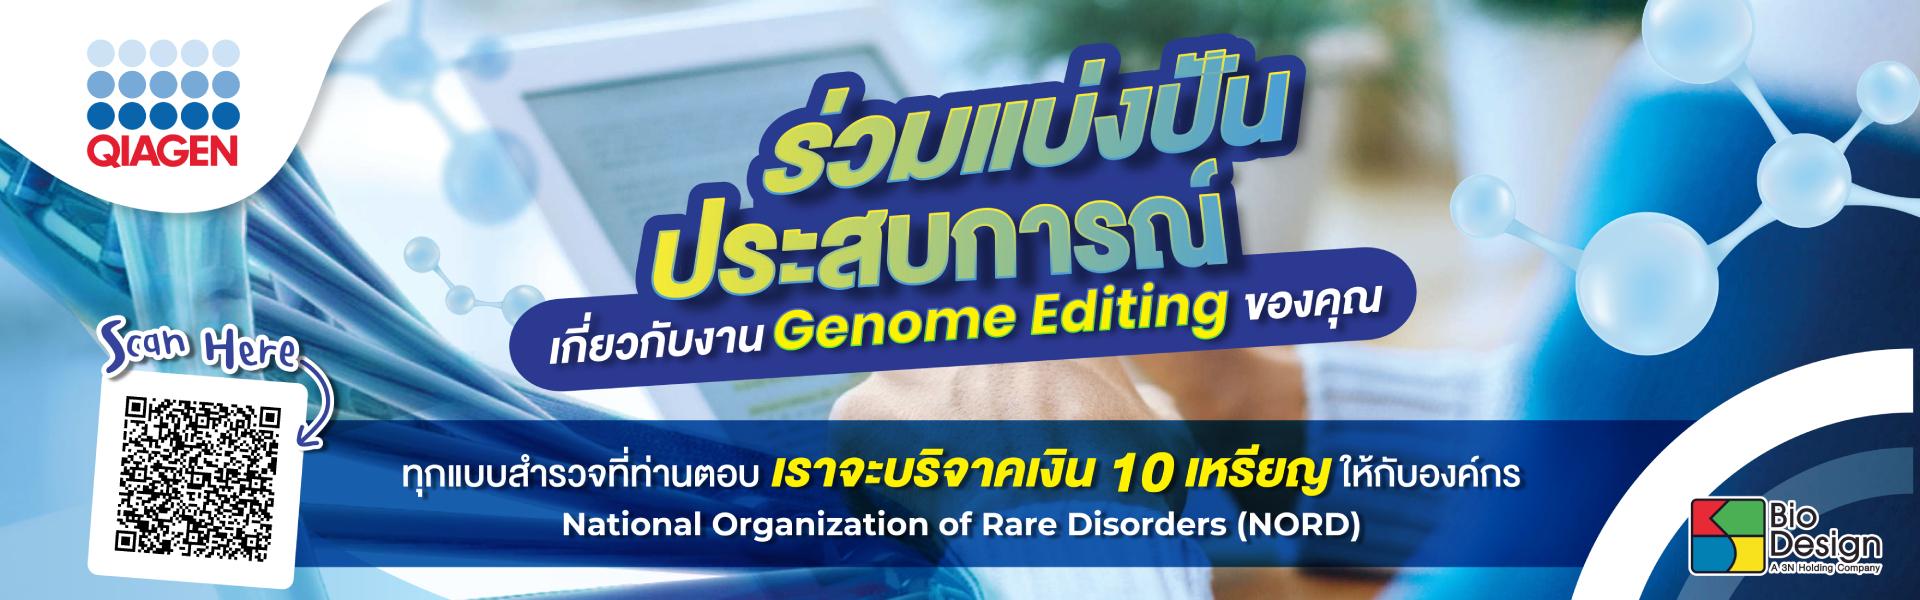 Genome editing survey